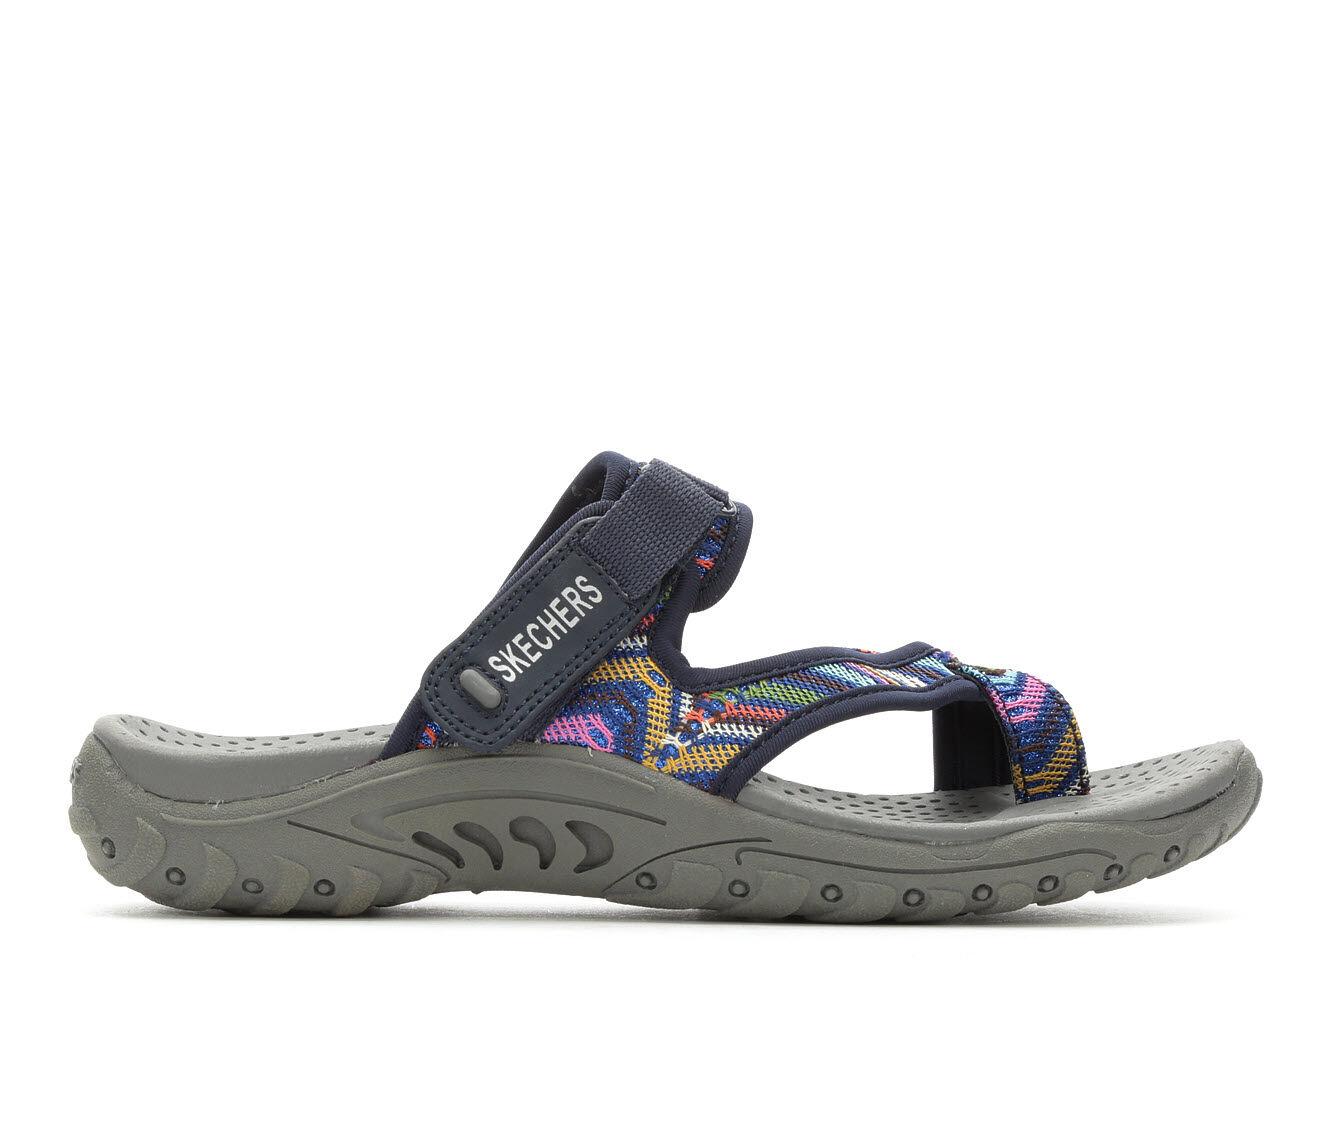 Women's Skechers Reggae 40974 Sandals Navy